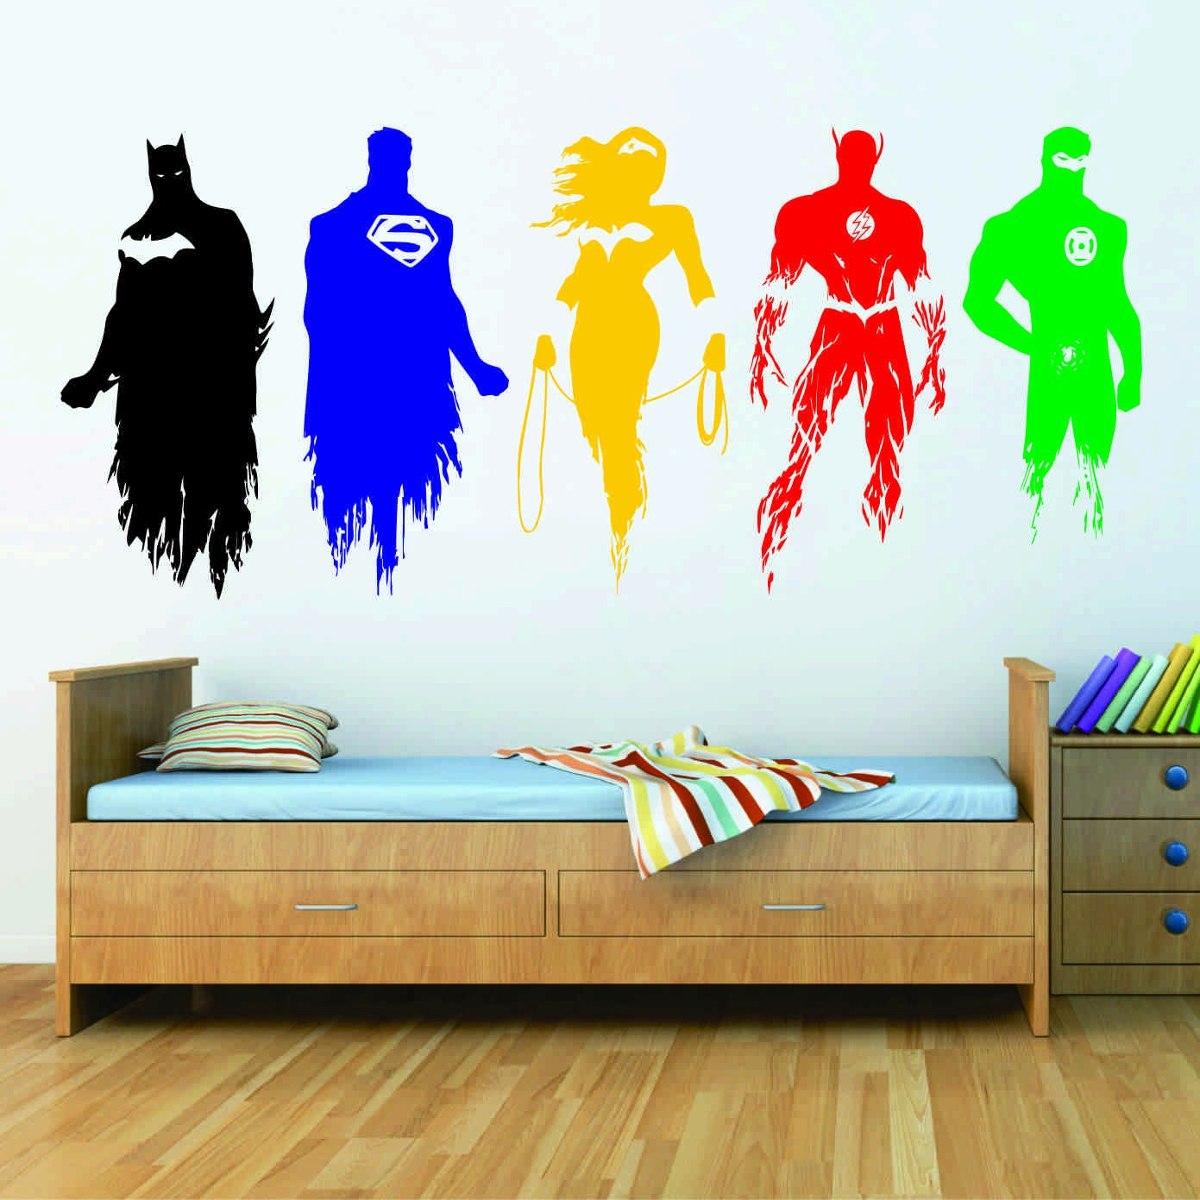 Vinil Decorativo Calca Personajes Liga De La Justicia 456 00  # Muebles A Medida La Justicia